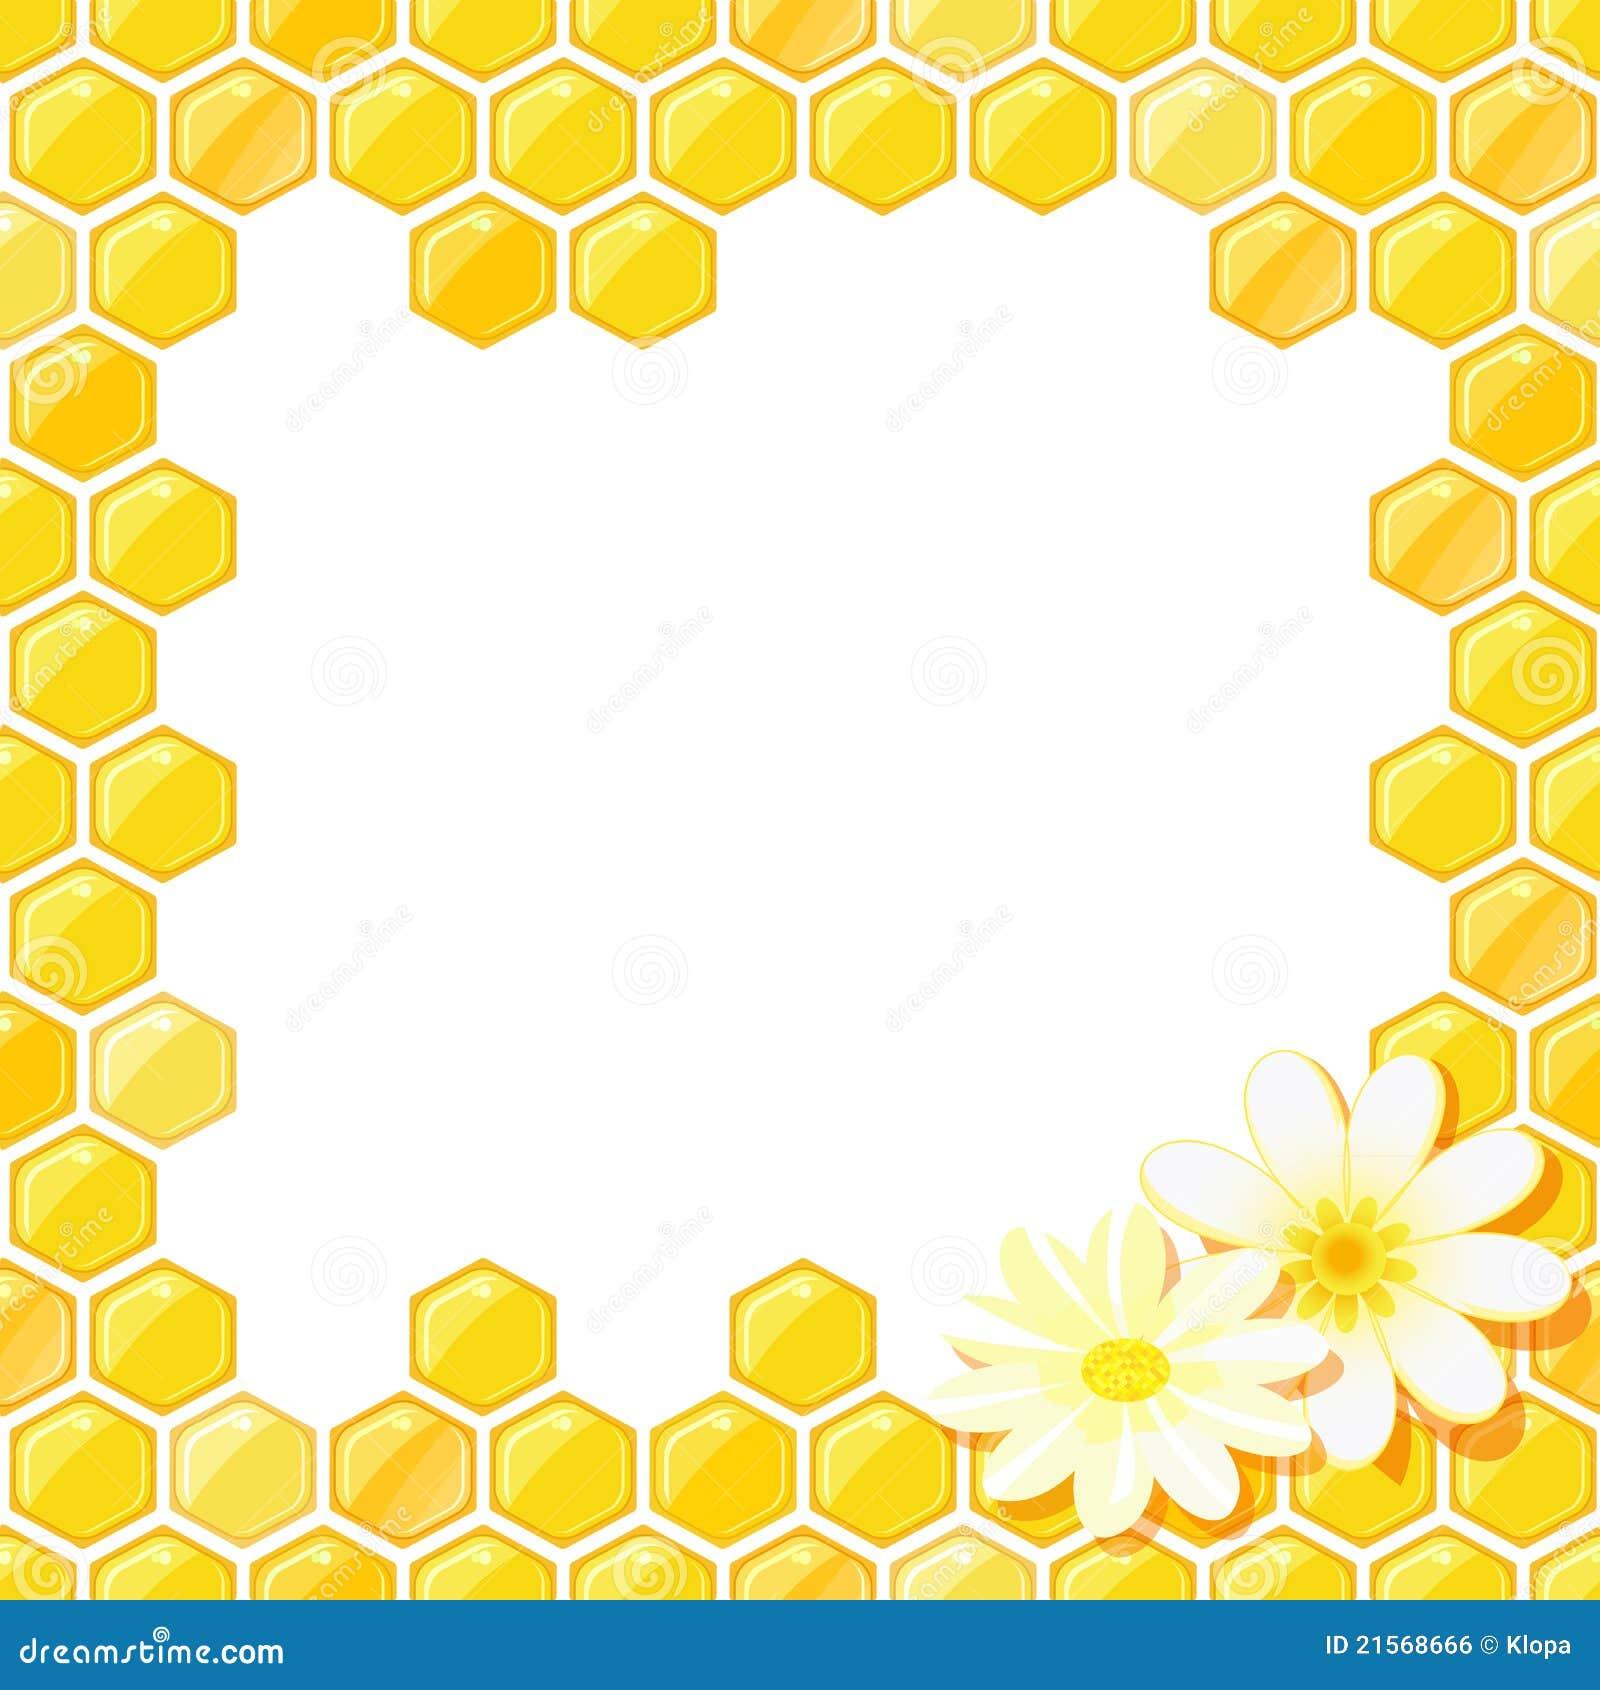 Bienenwabe-Feld Mit Blume Lizenzfreies Stockbild - Bild ...